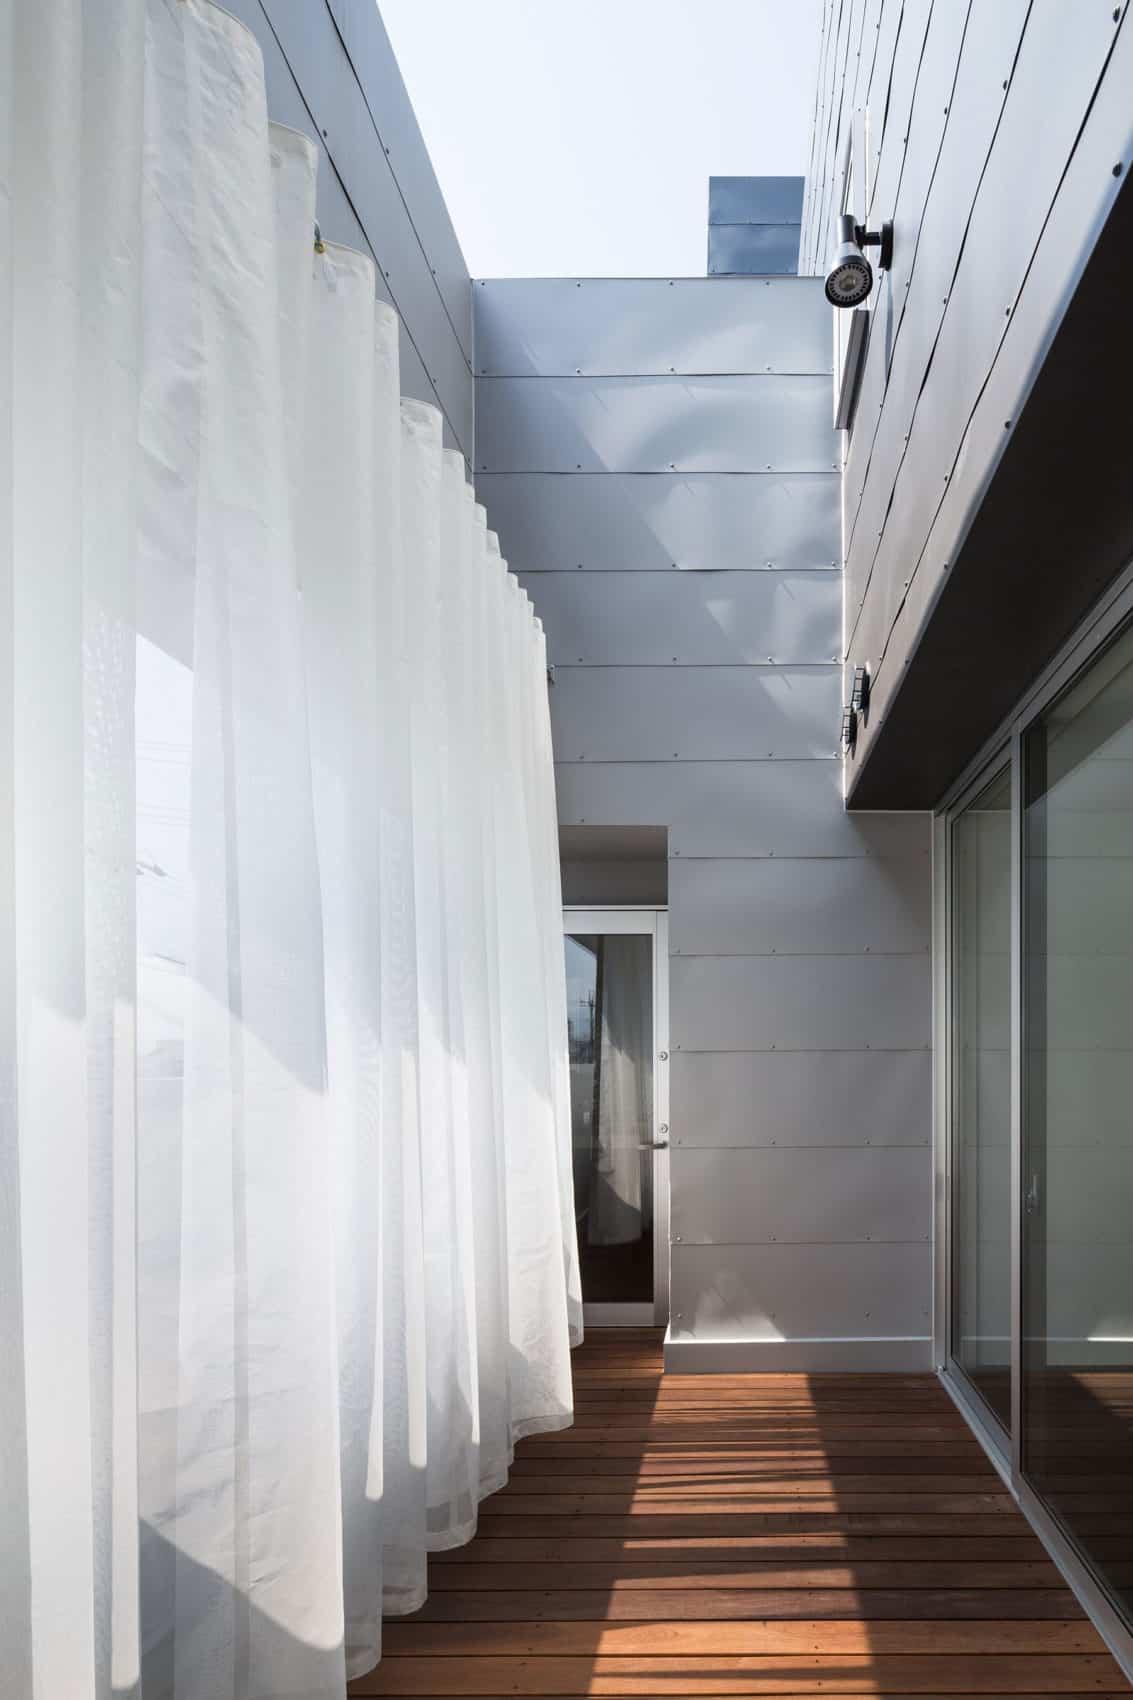 Complex by FORM | Kouichi Kimura Architects (4)